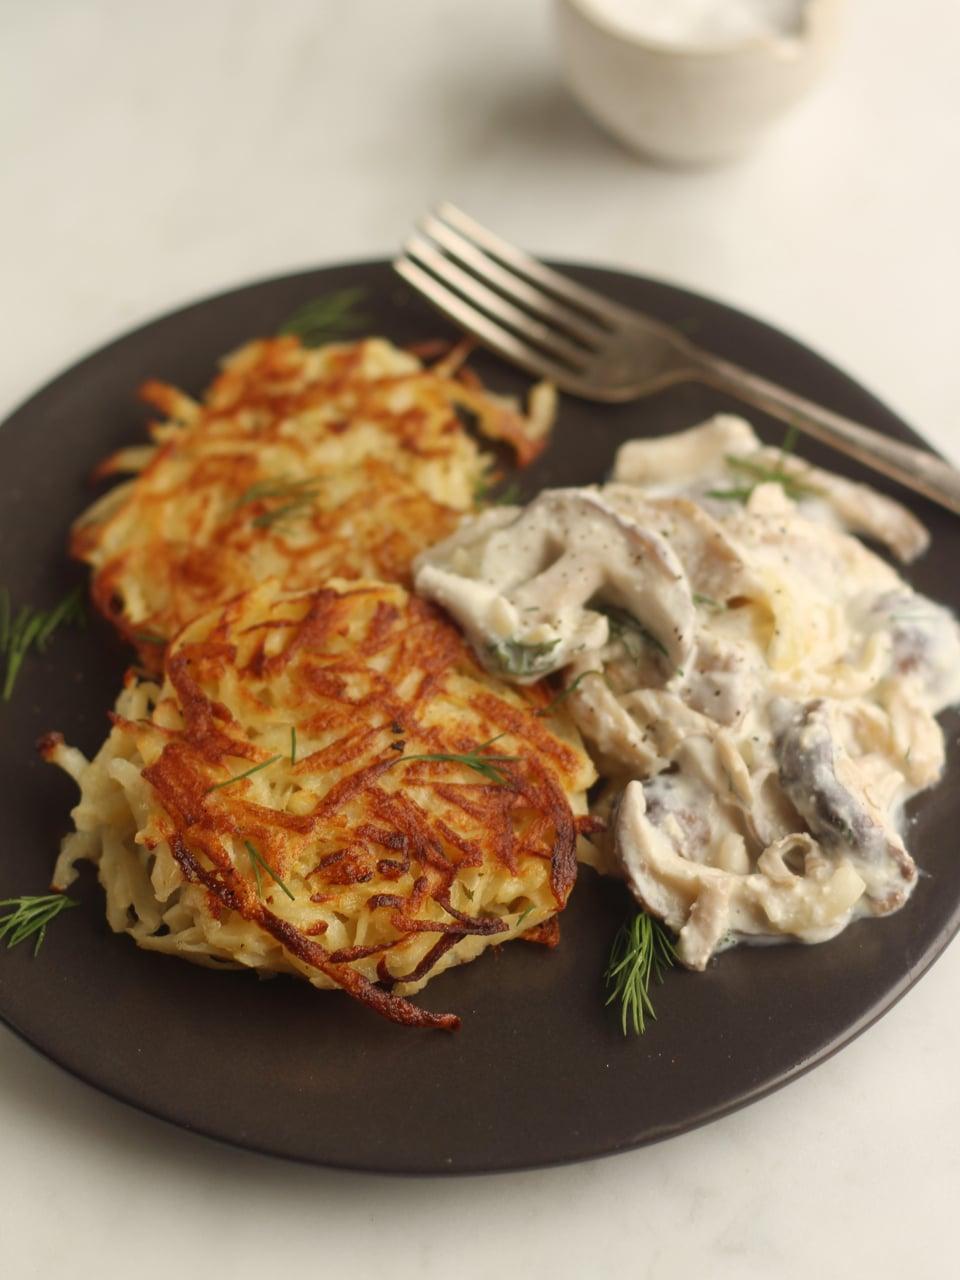 Potato Pancakes with Mushroom Sauce a vegetariian recipe from Ren Behan's Wild Honey and Rye, Modern Polish Recipes